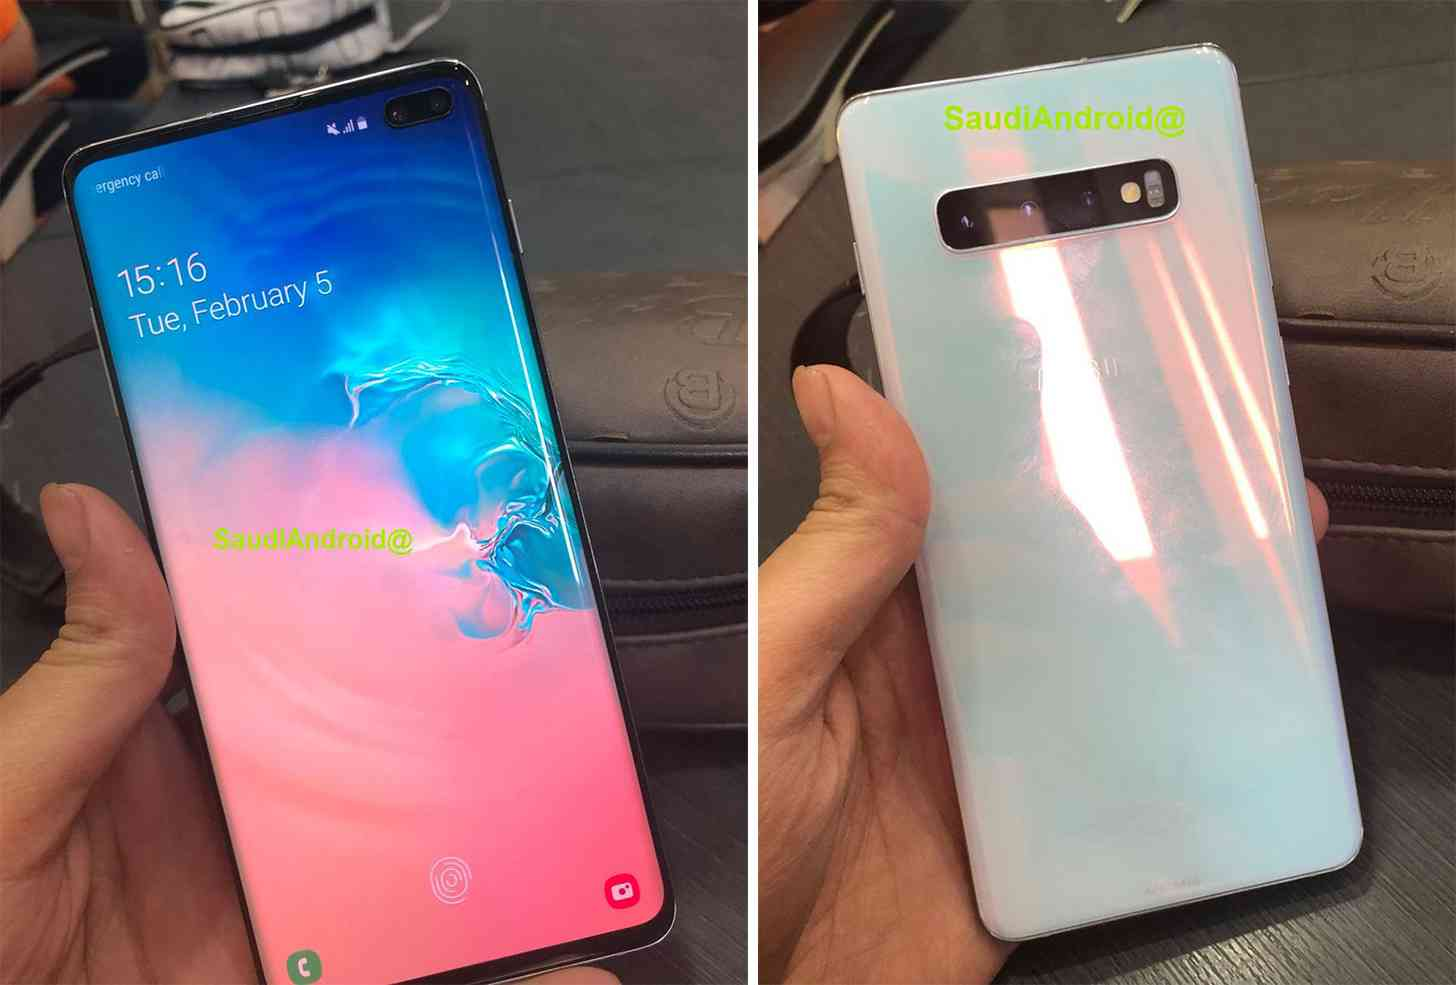 Samsung Galaxy S10+ in-display fingerprint sensor